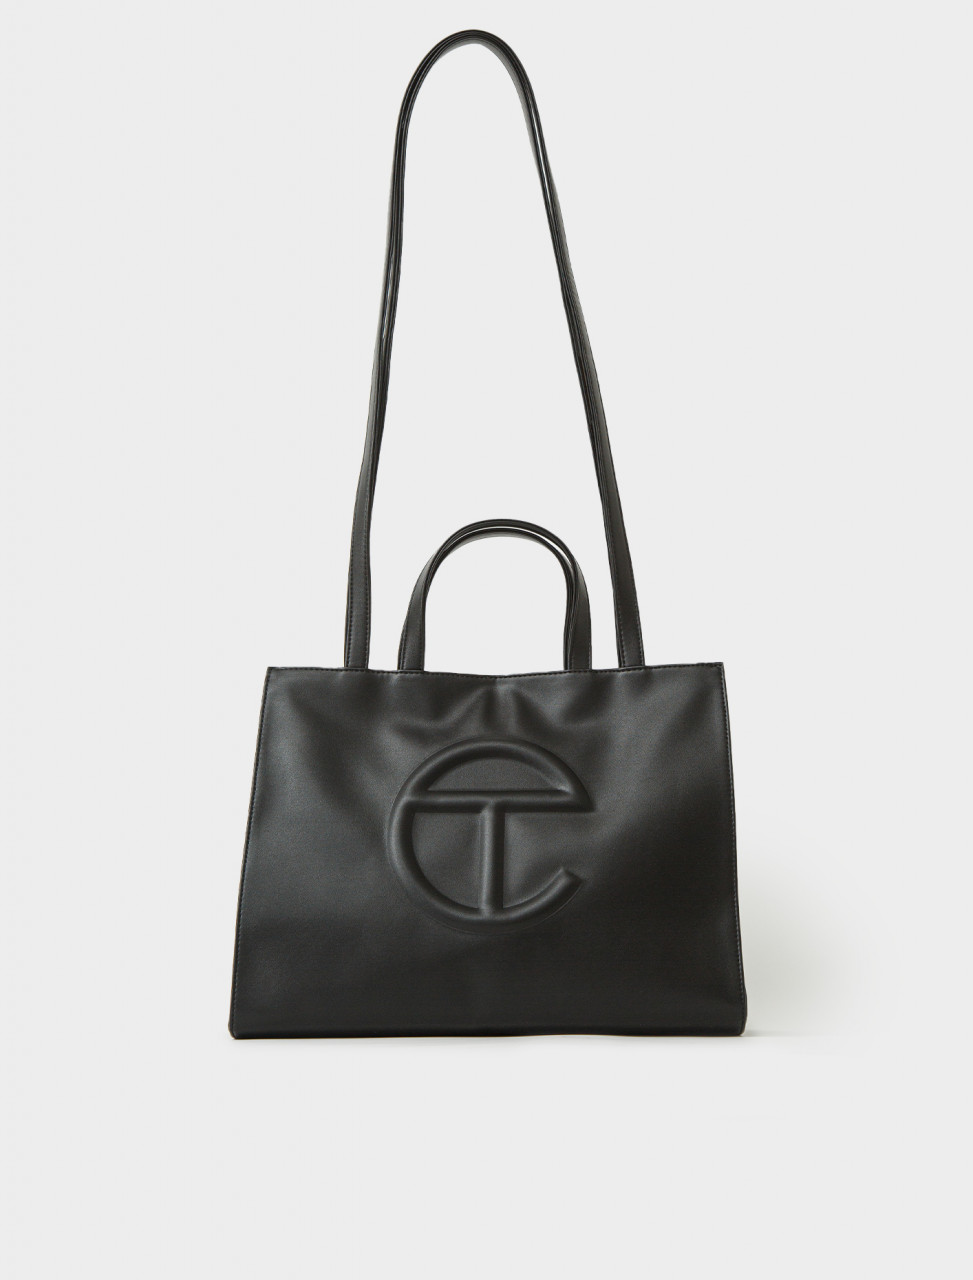 Medium Shopper in Black